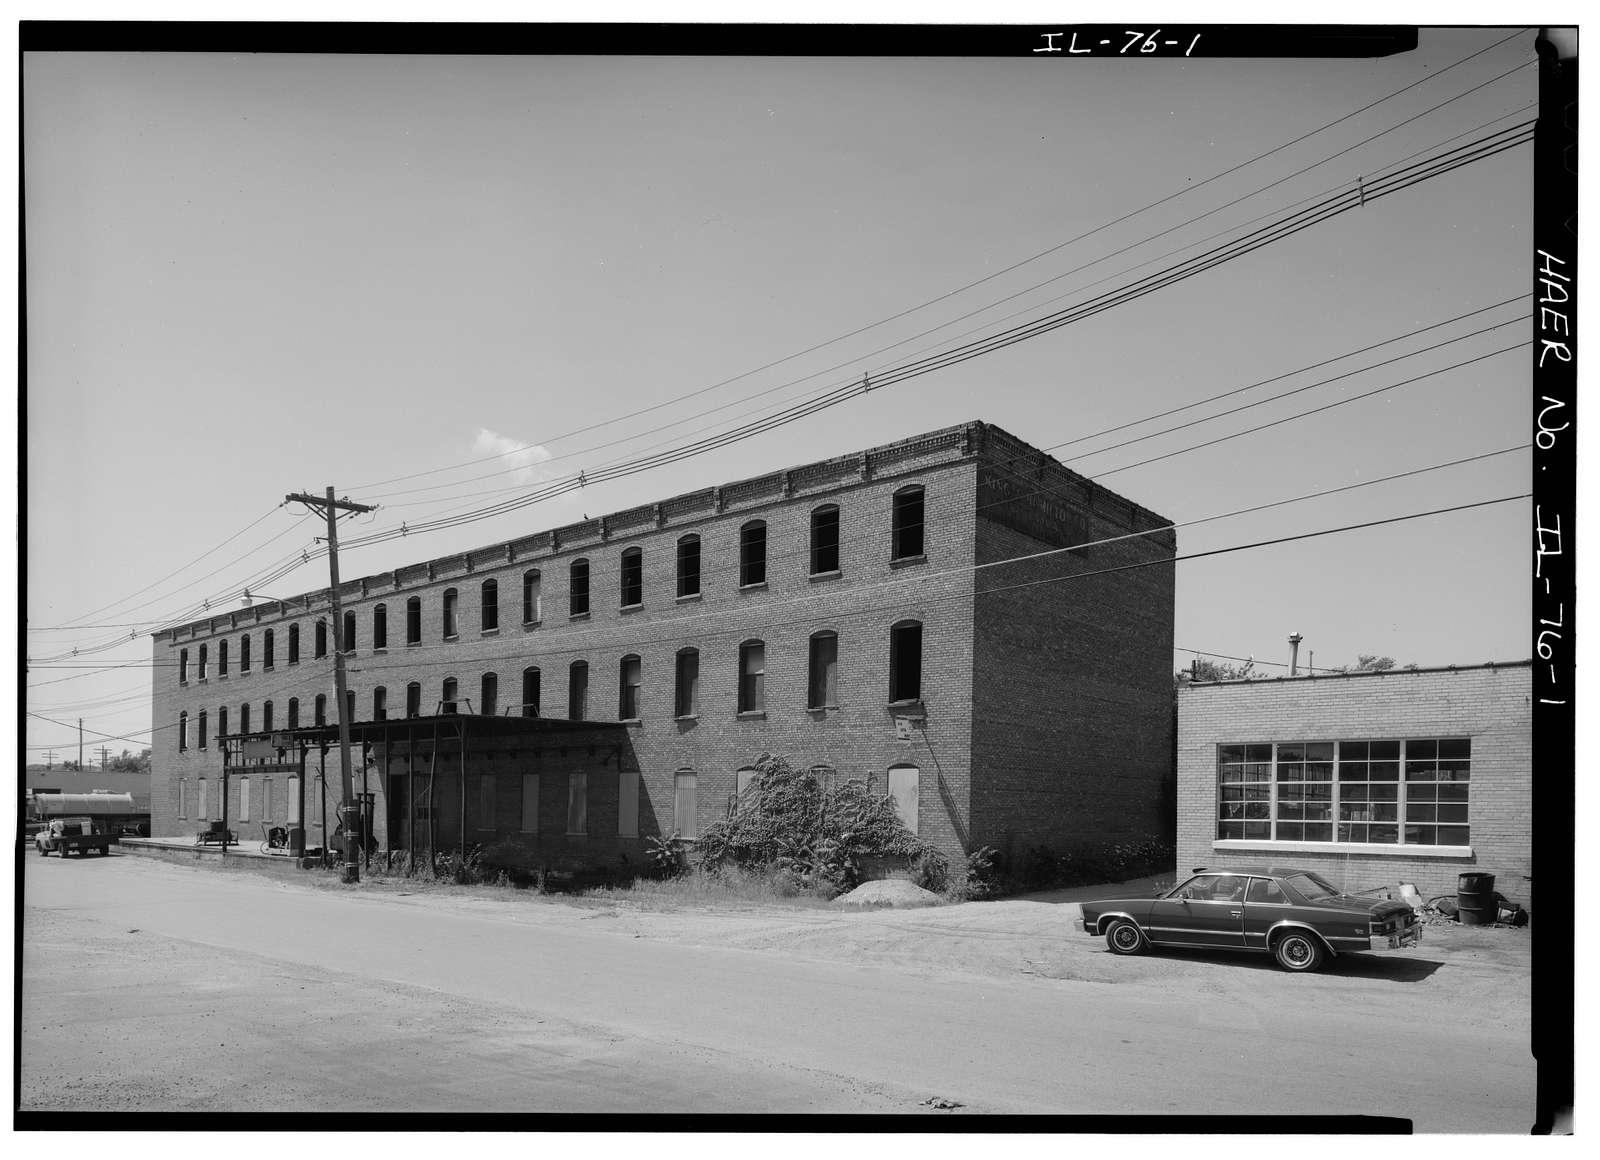 King & Hamilton Agricultural Implement Manufacturing Company, Clinton & Marquette Streets, Ottawa, La Salle County, IL